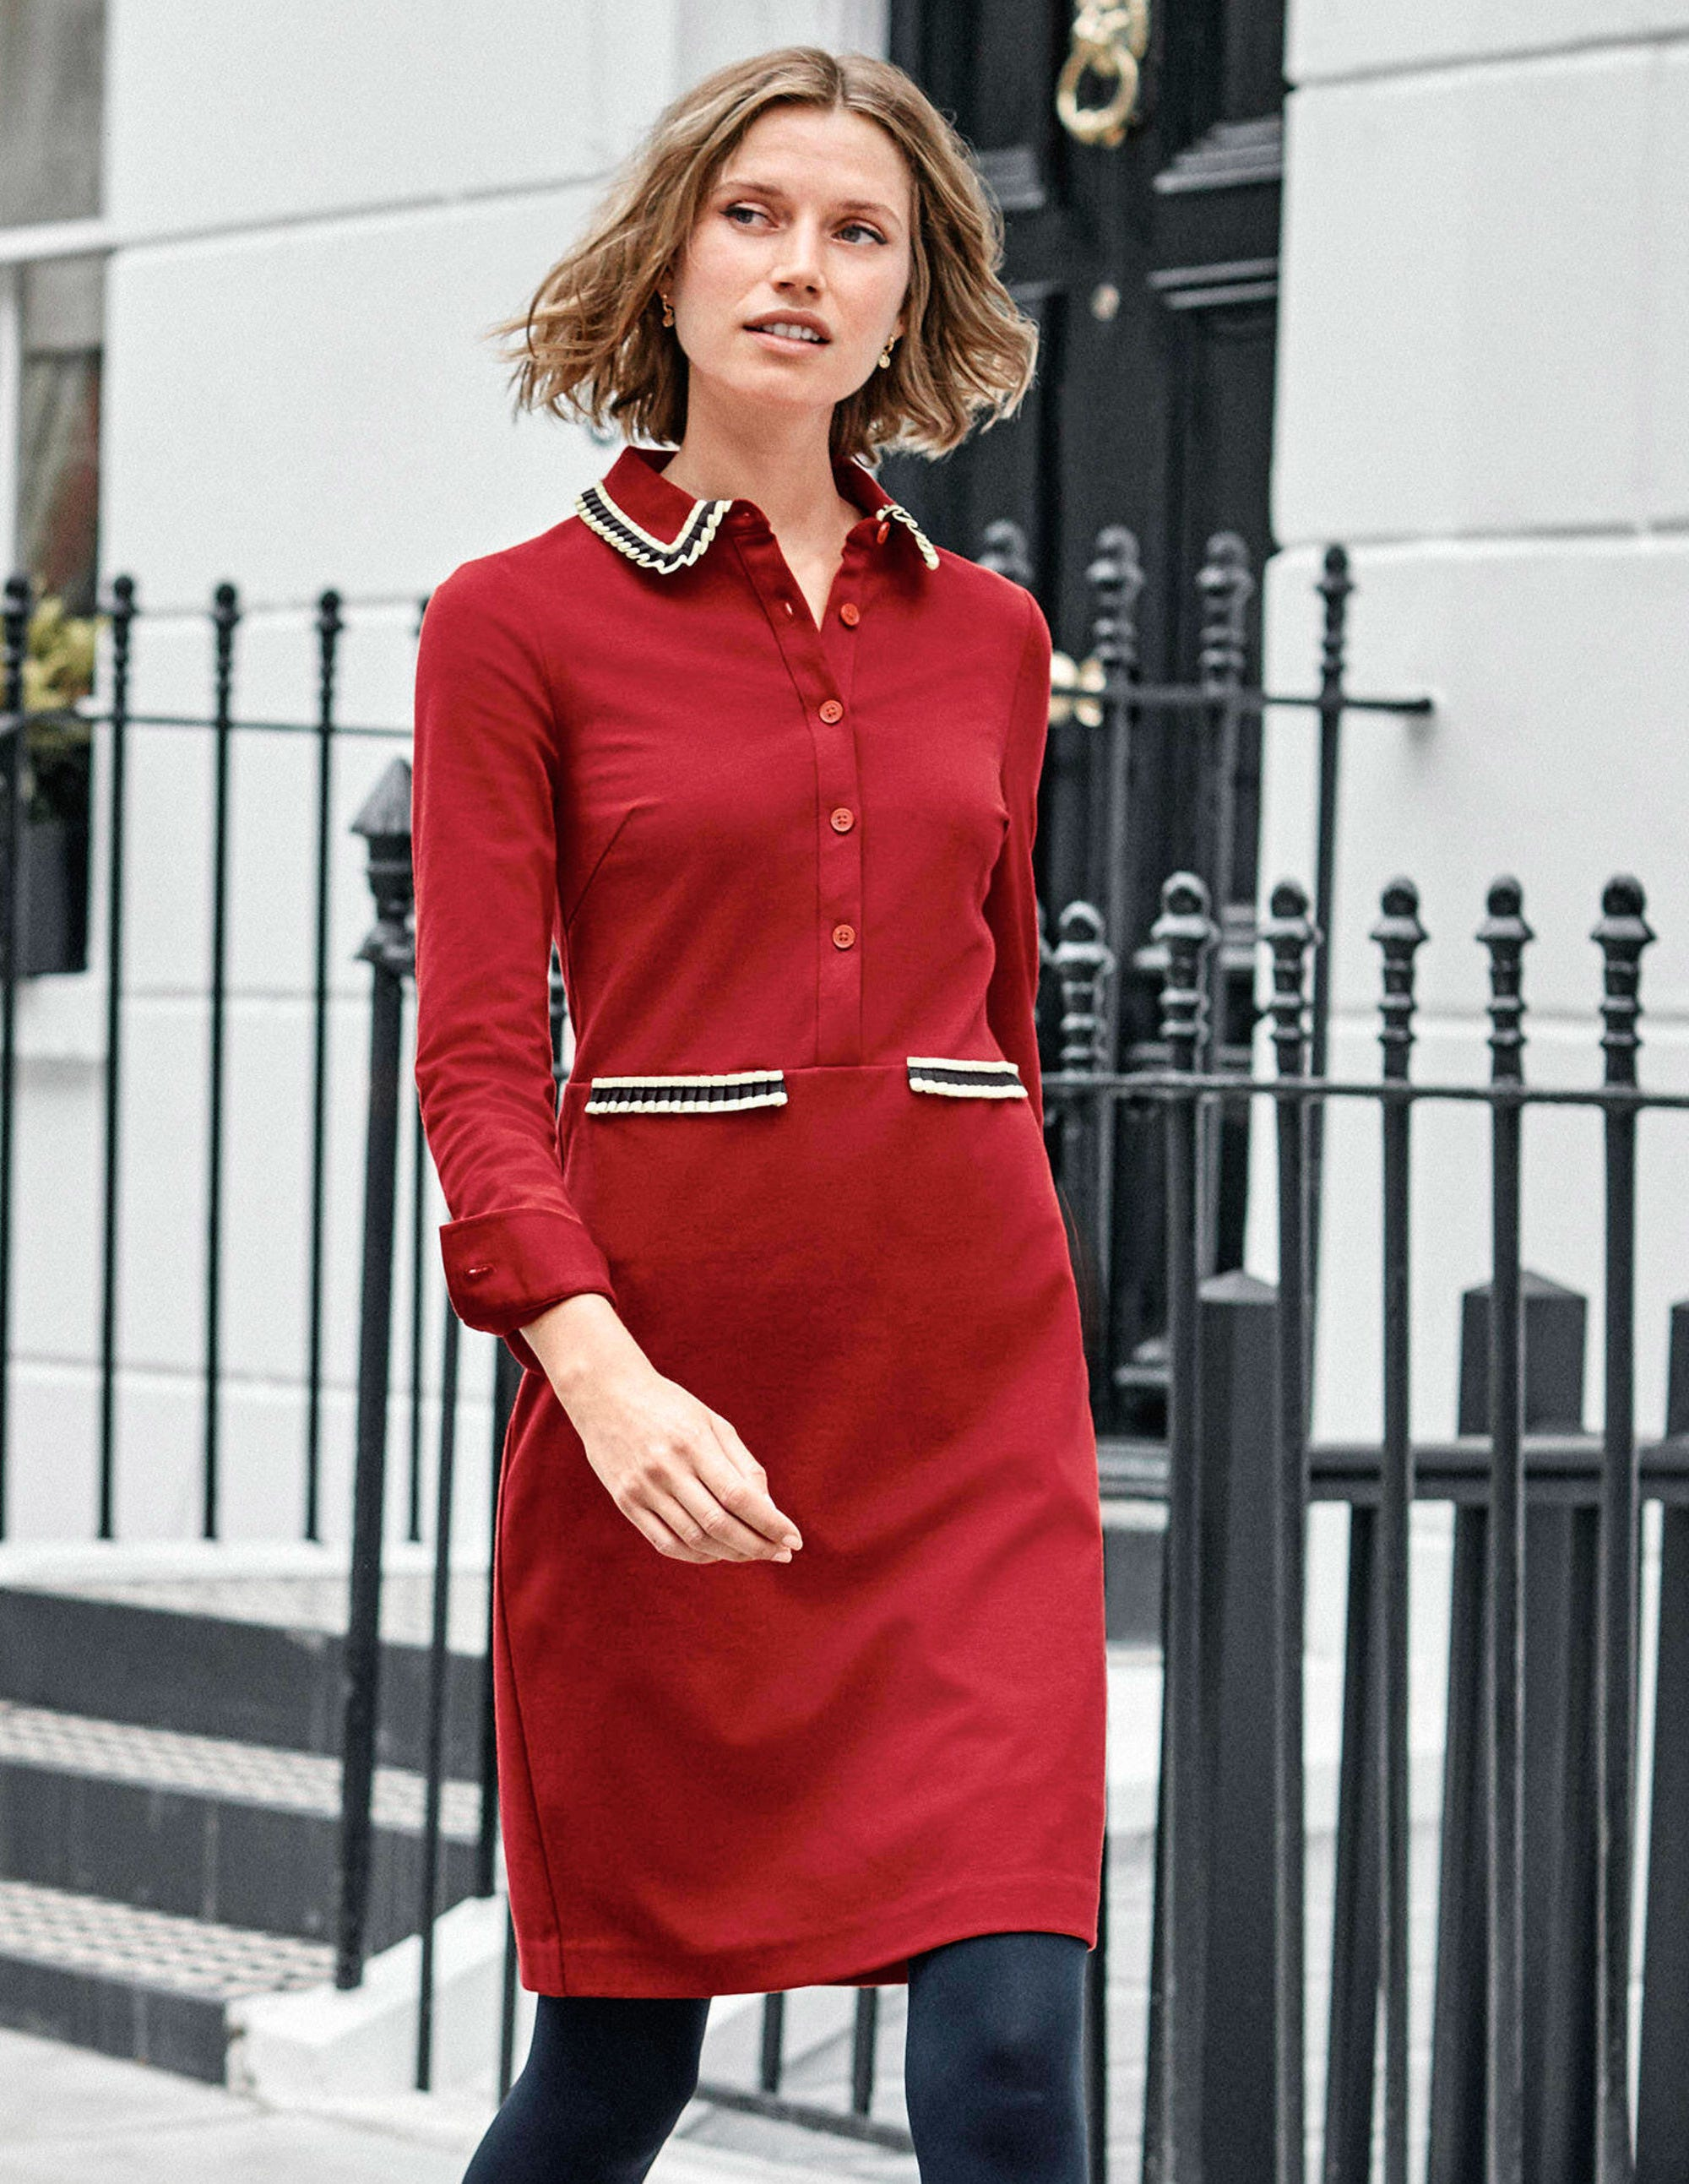 Boden Amber Ponte Dress - Poinsettia